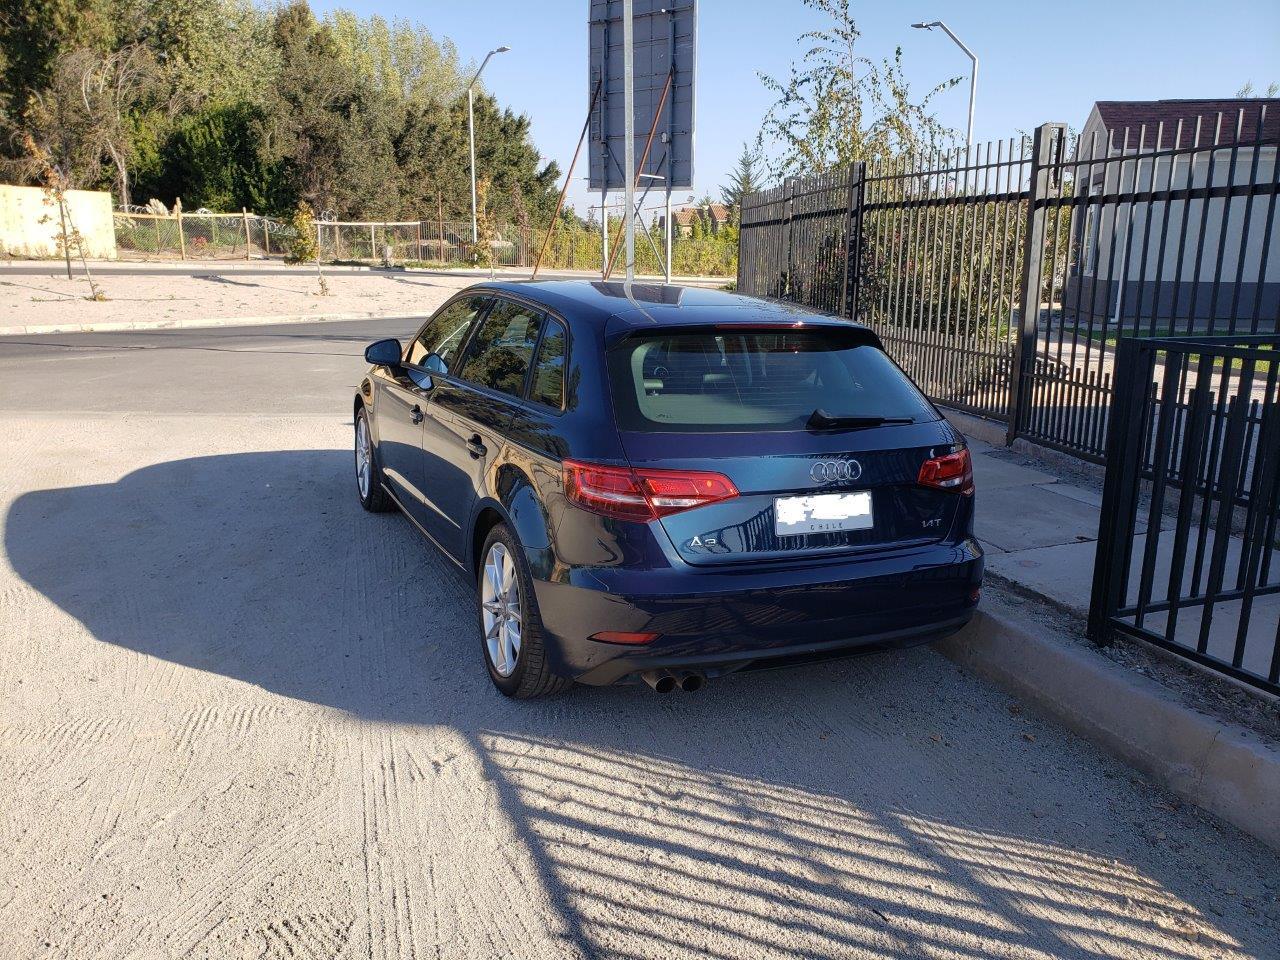 Audi A3 Sportback FL 1.4 TFSI año 2018